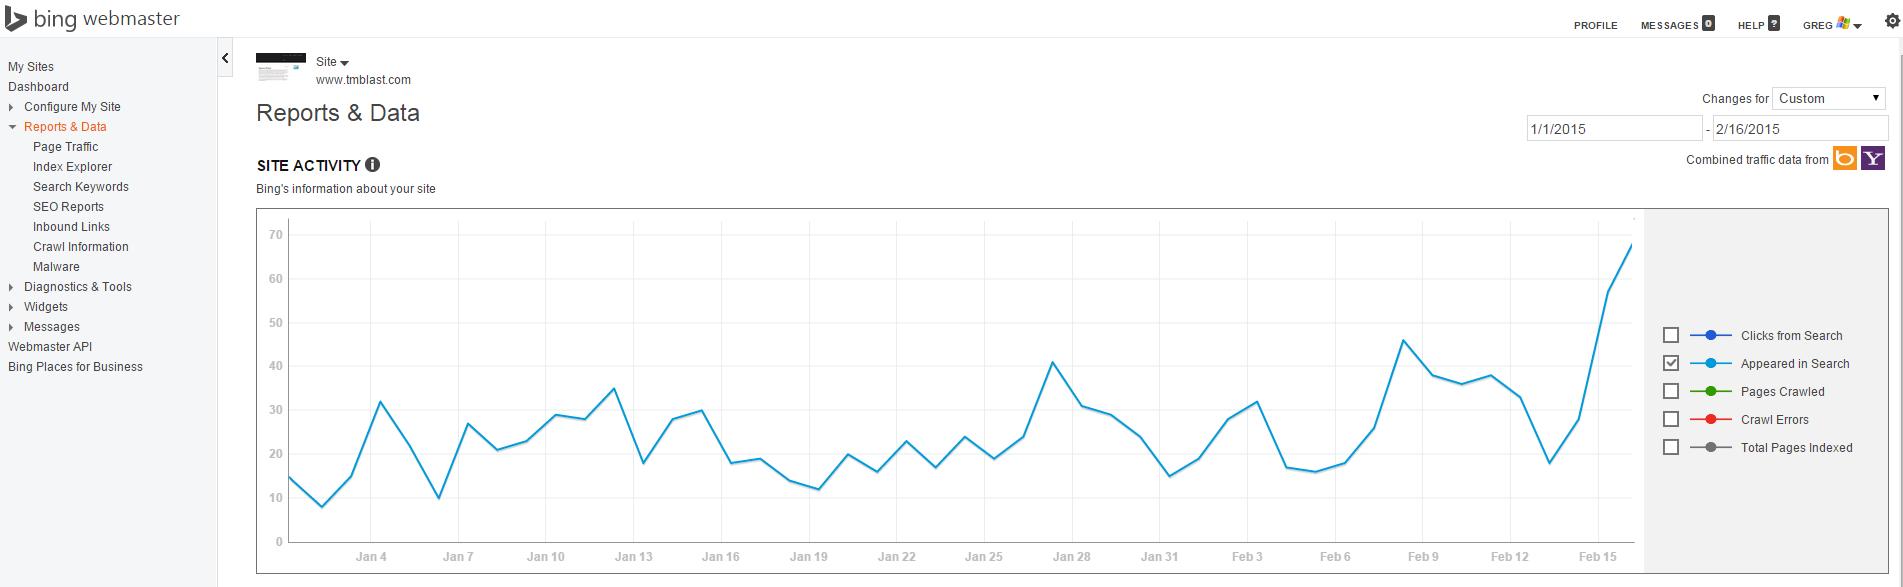 Bing Data